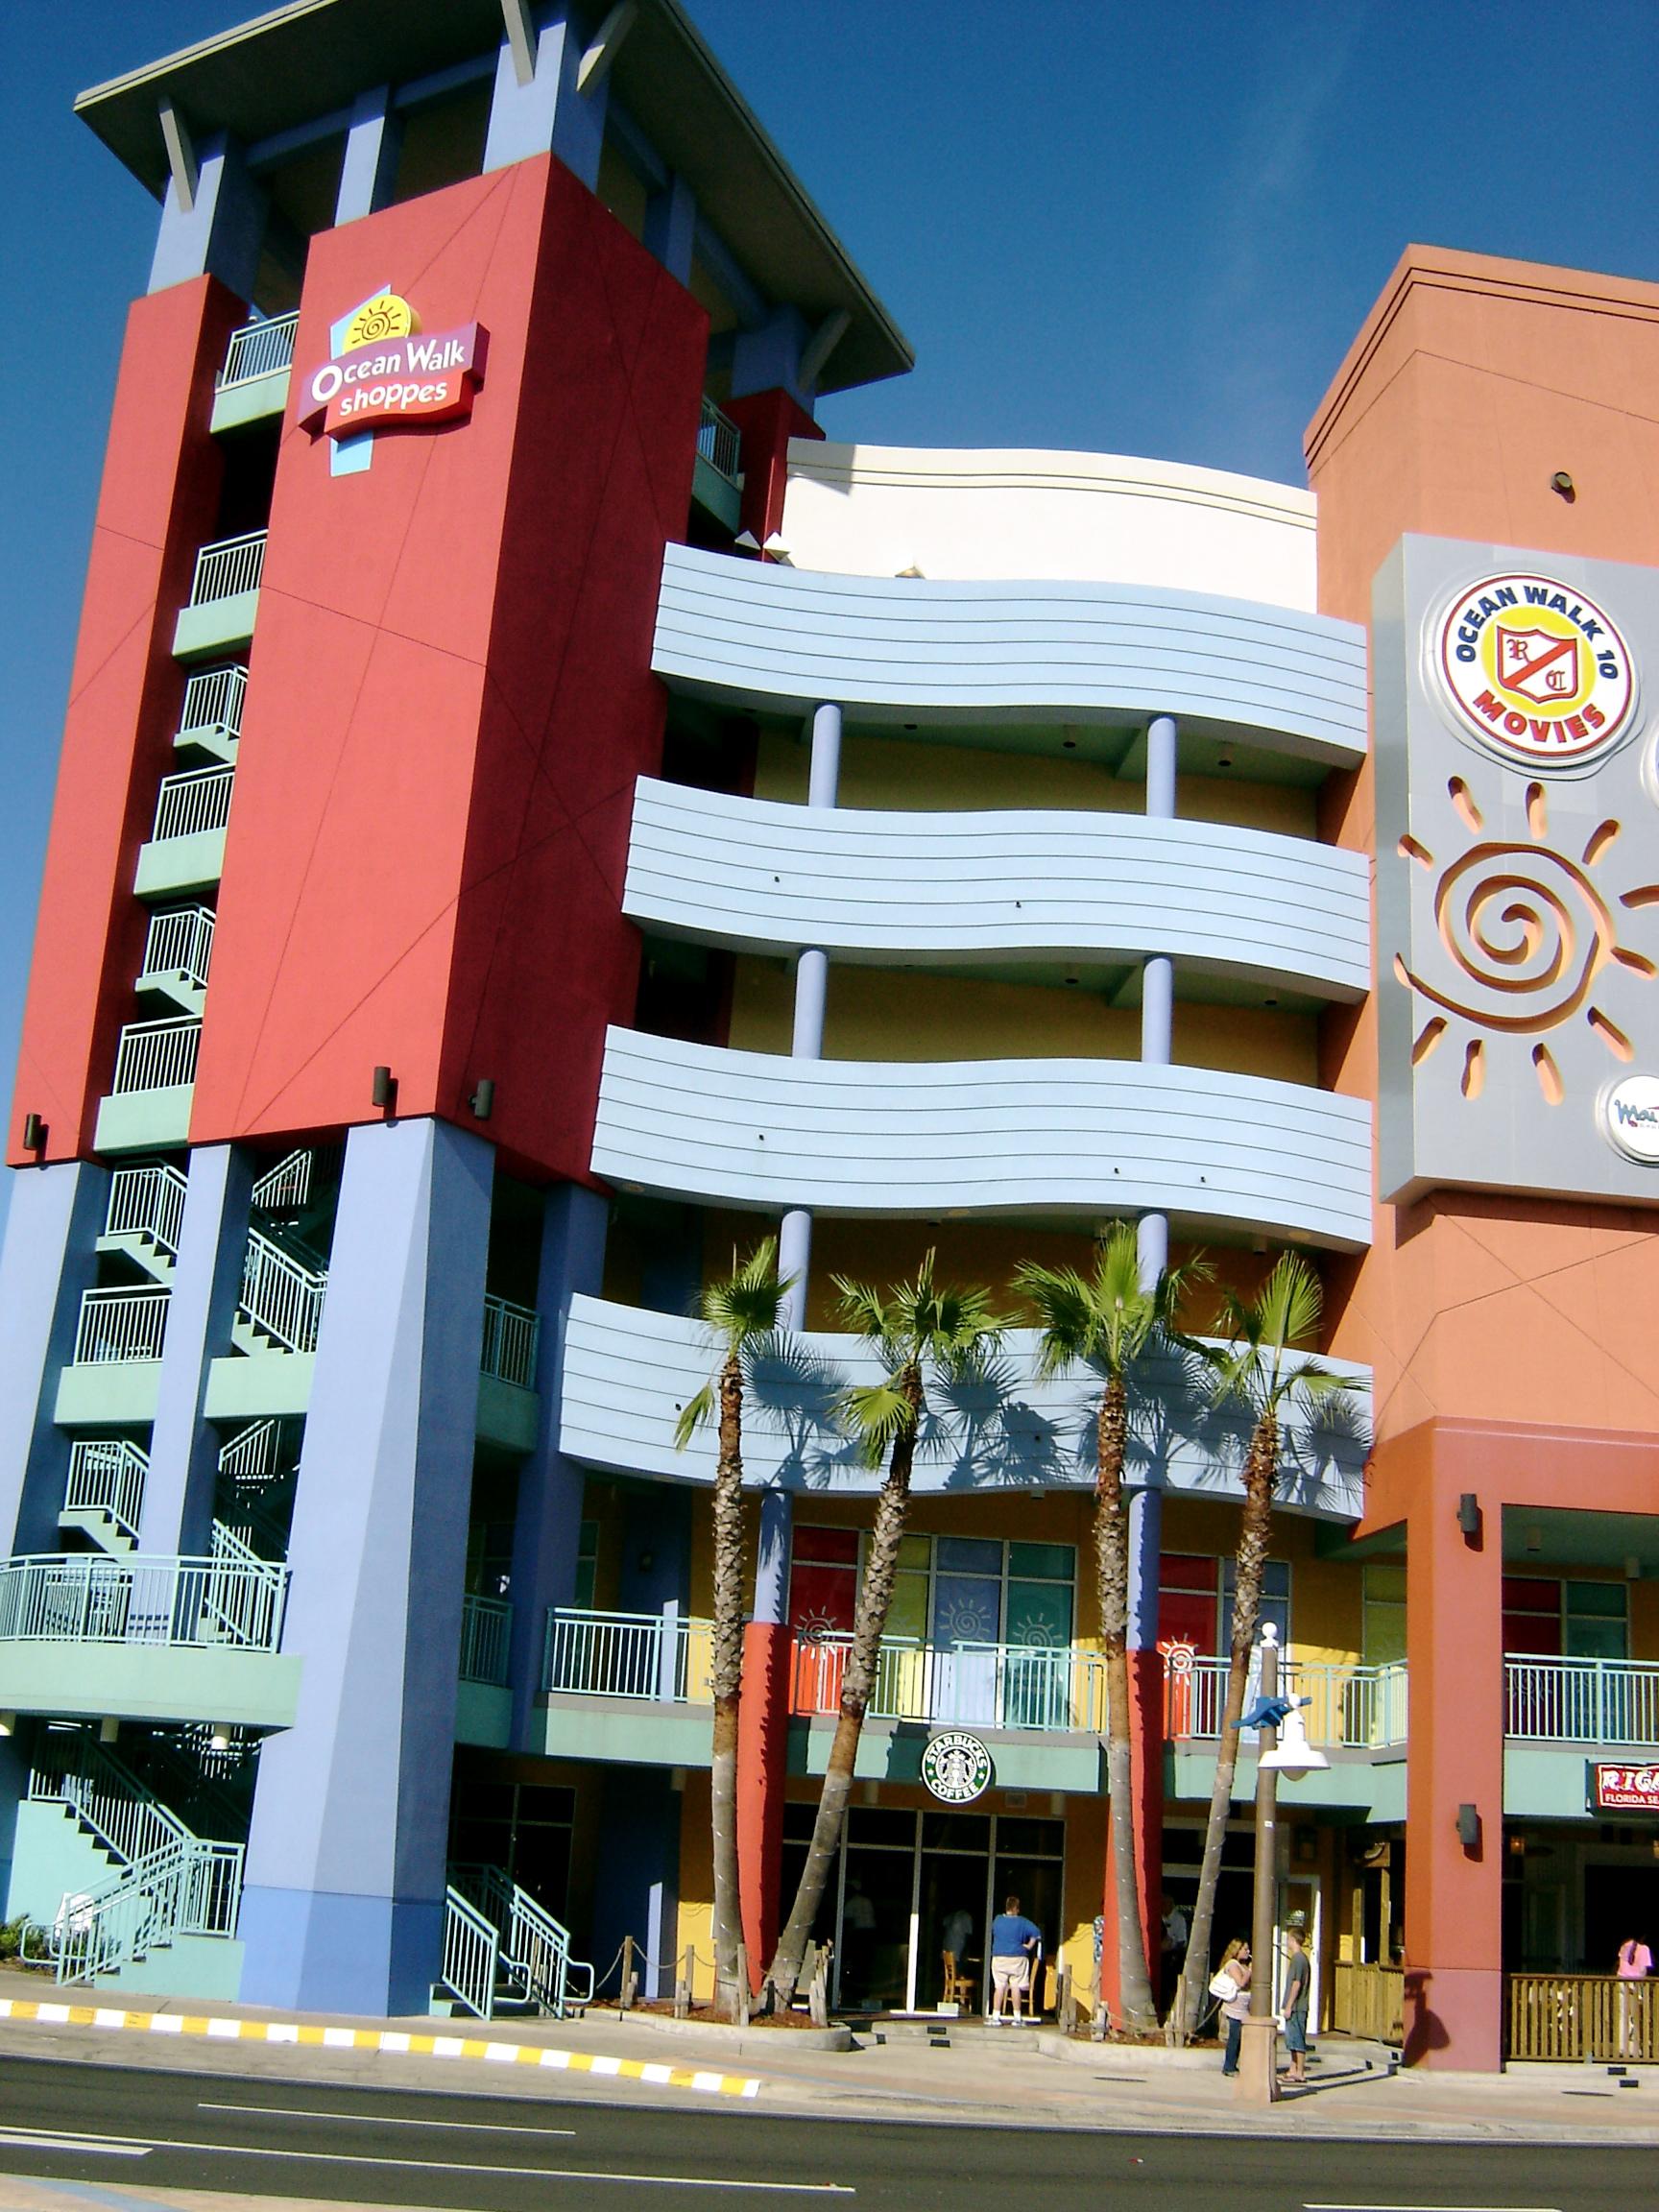 Daytona Beach Oceanwalk Theater